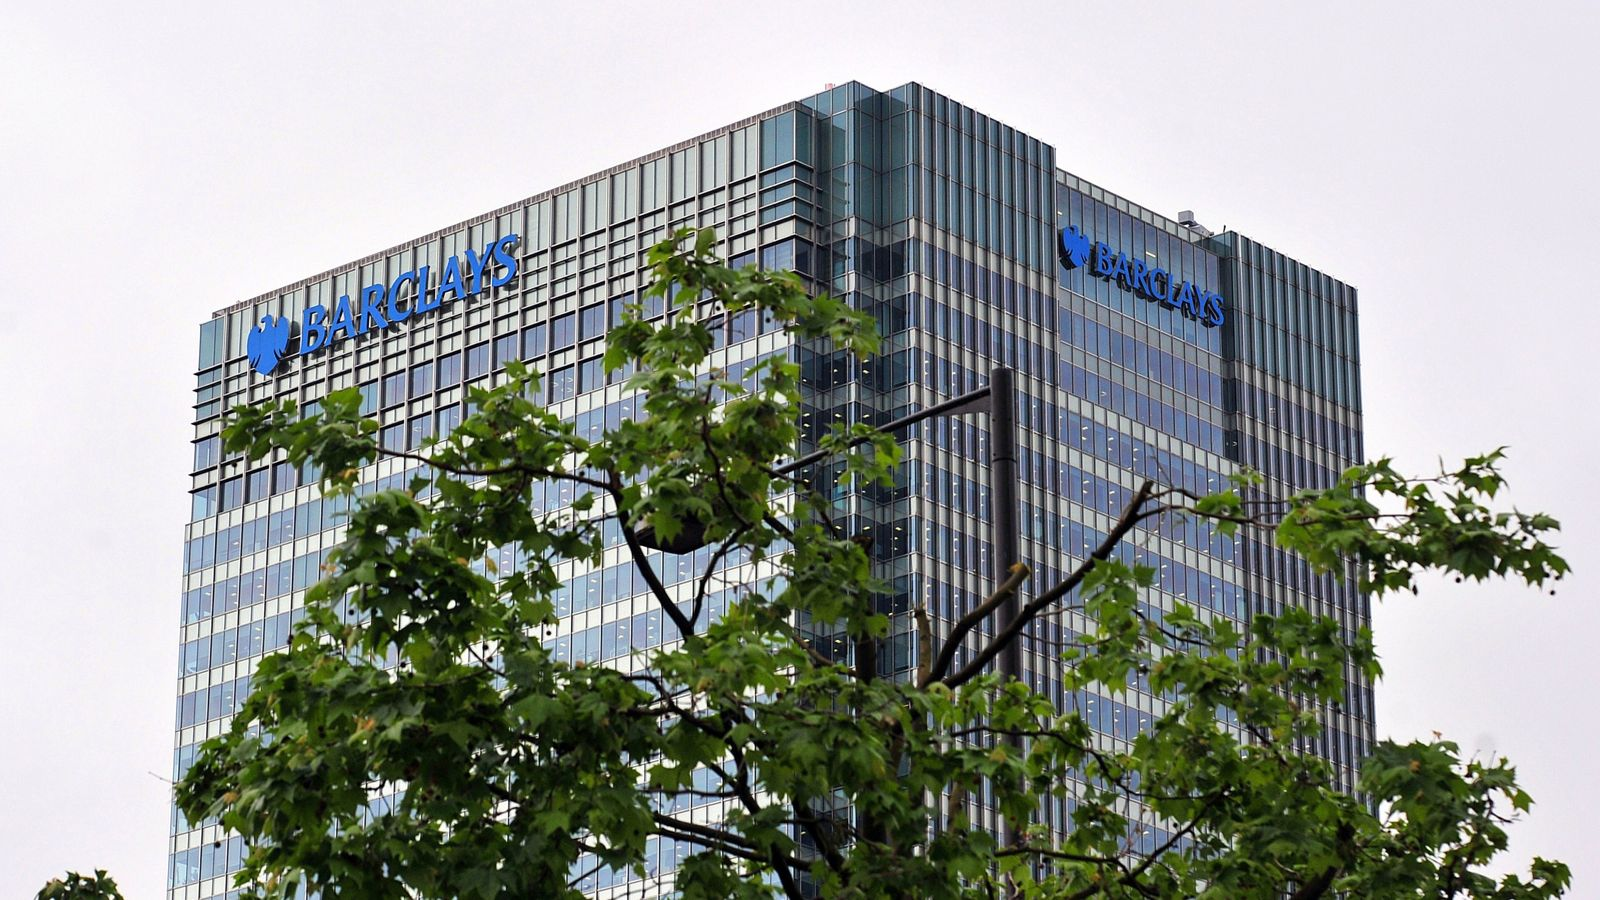 Regulators probe Barclays over whistleblower